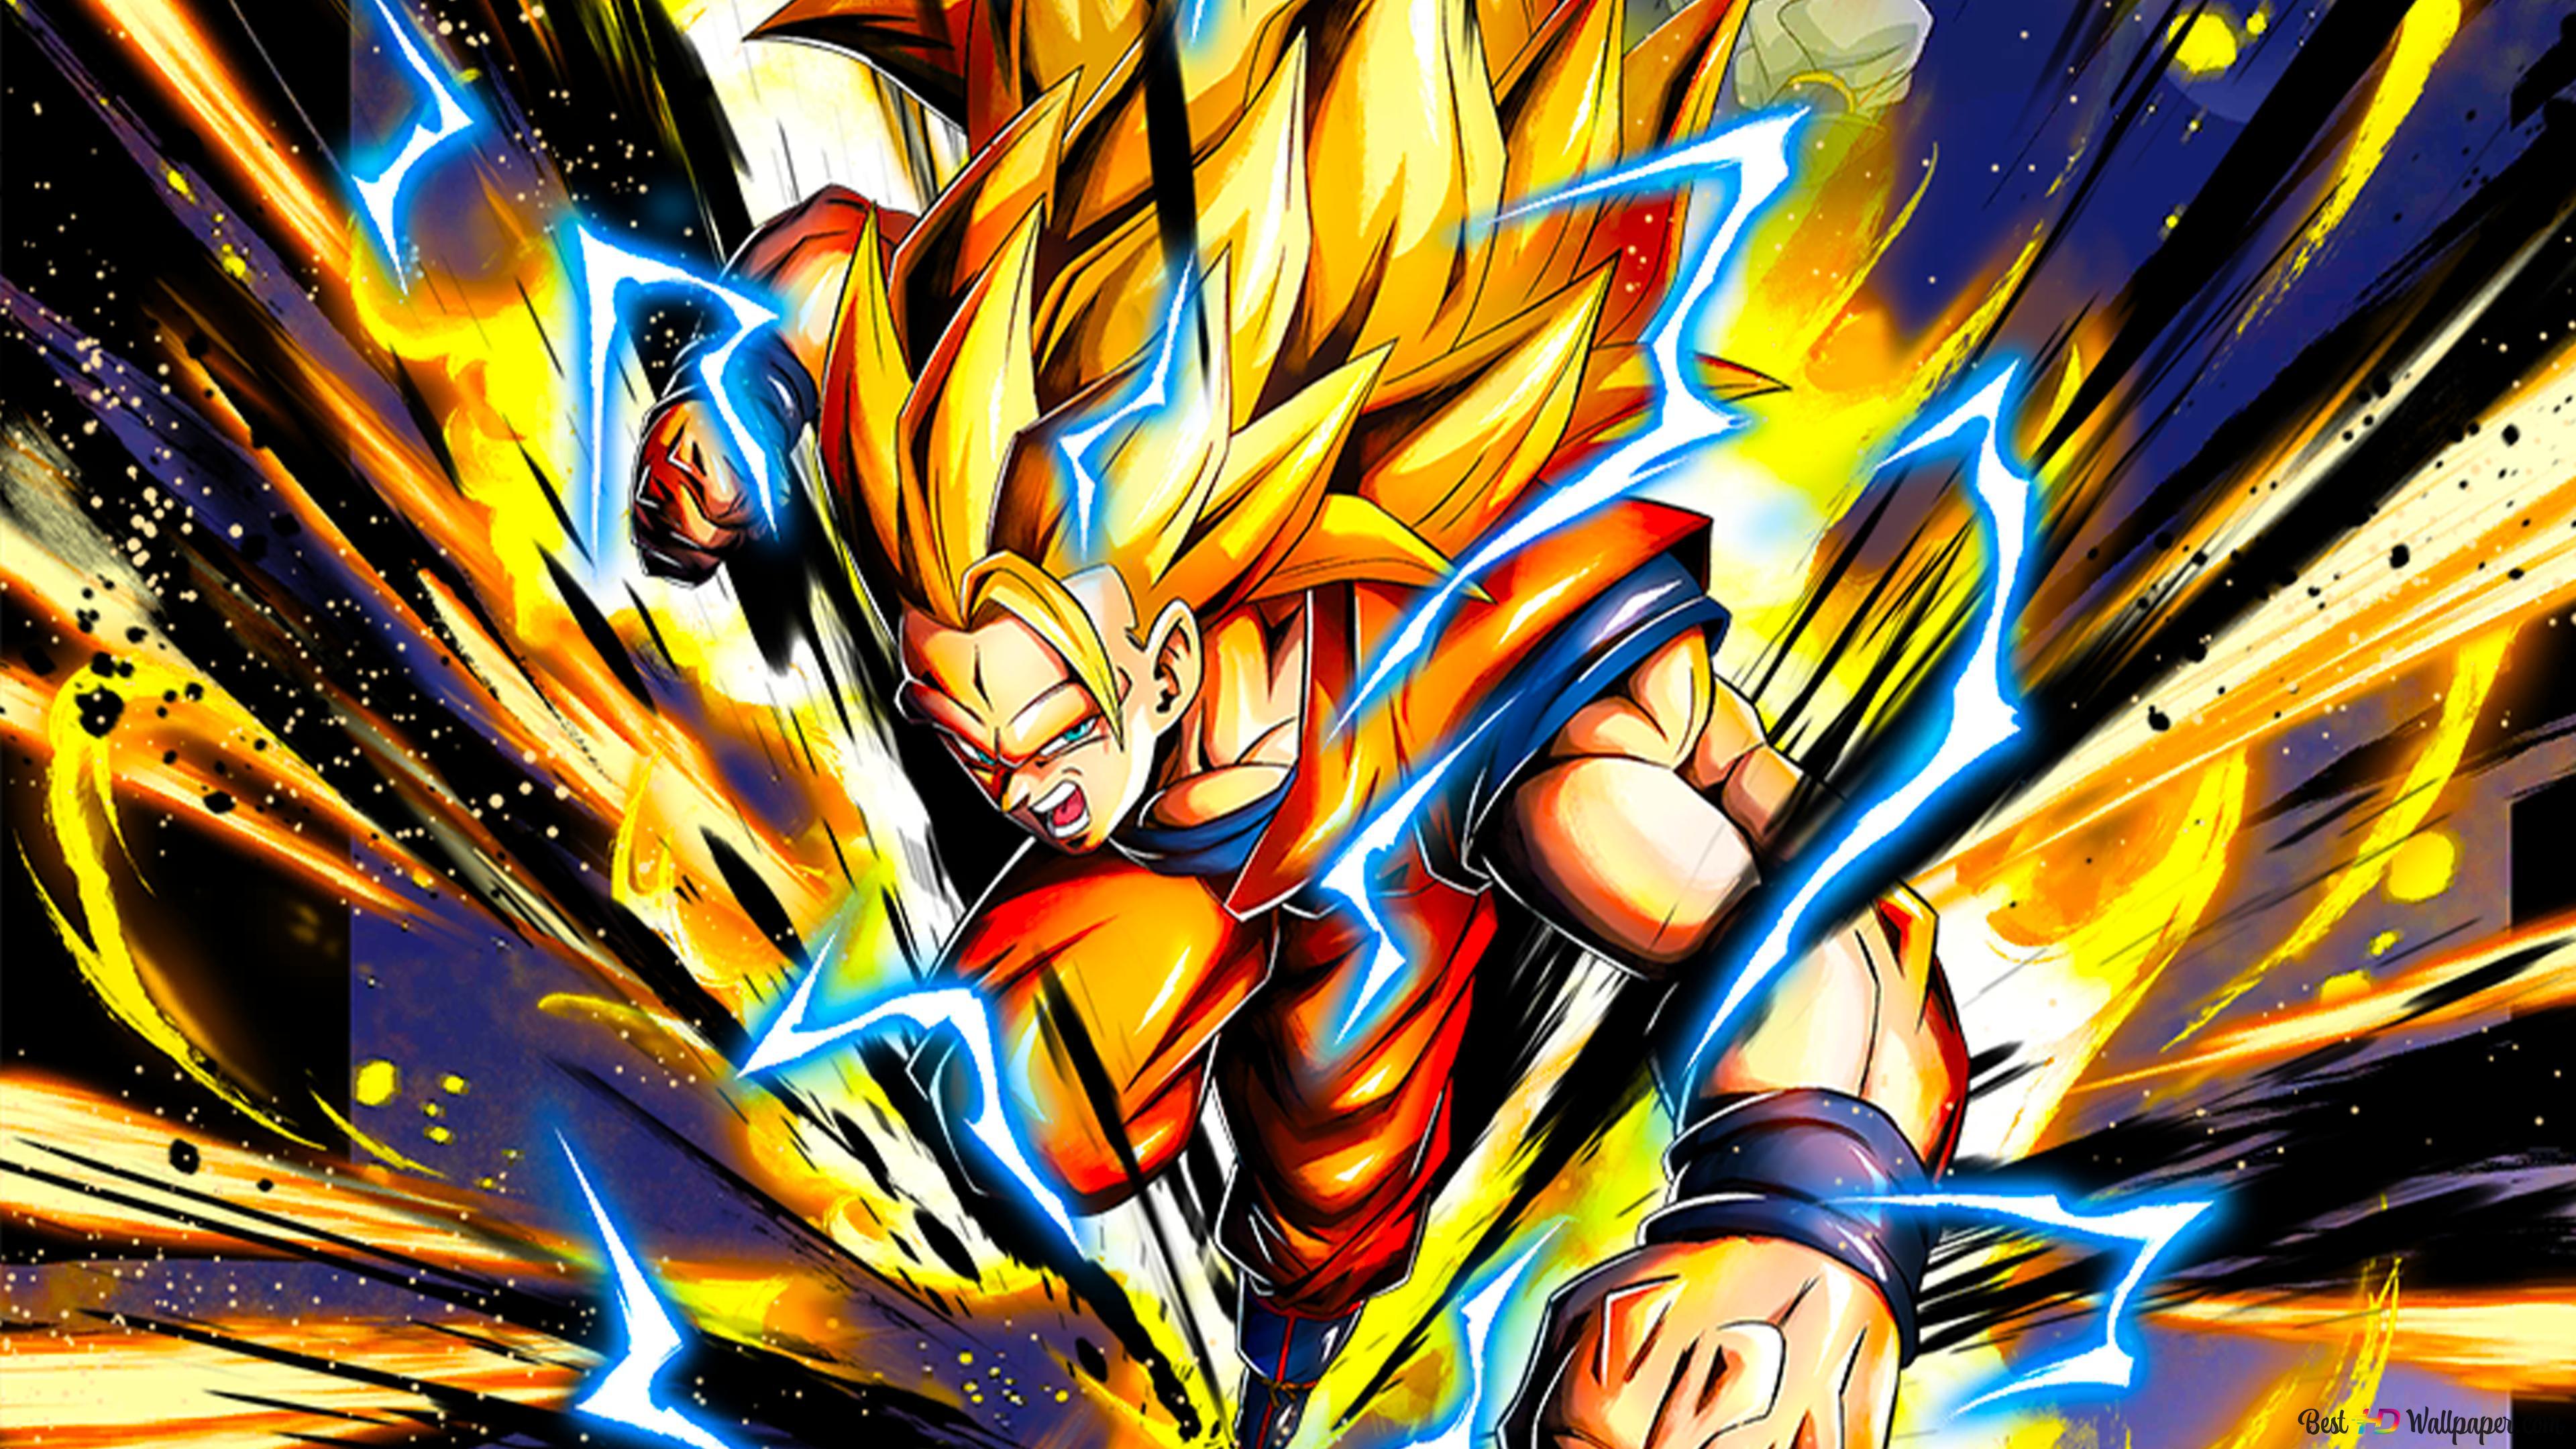 Super Saiyan 3 Goku From Dragon Ball Z Dragon Ball Legends Arts For Desktop Hd Wallpaper Download